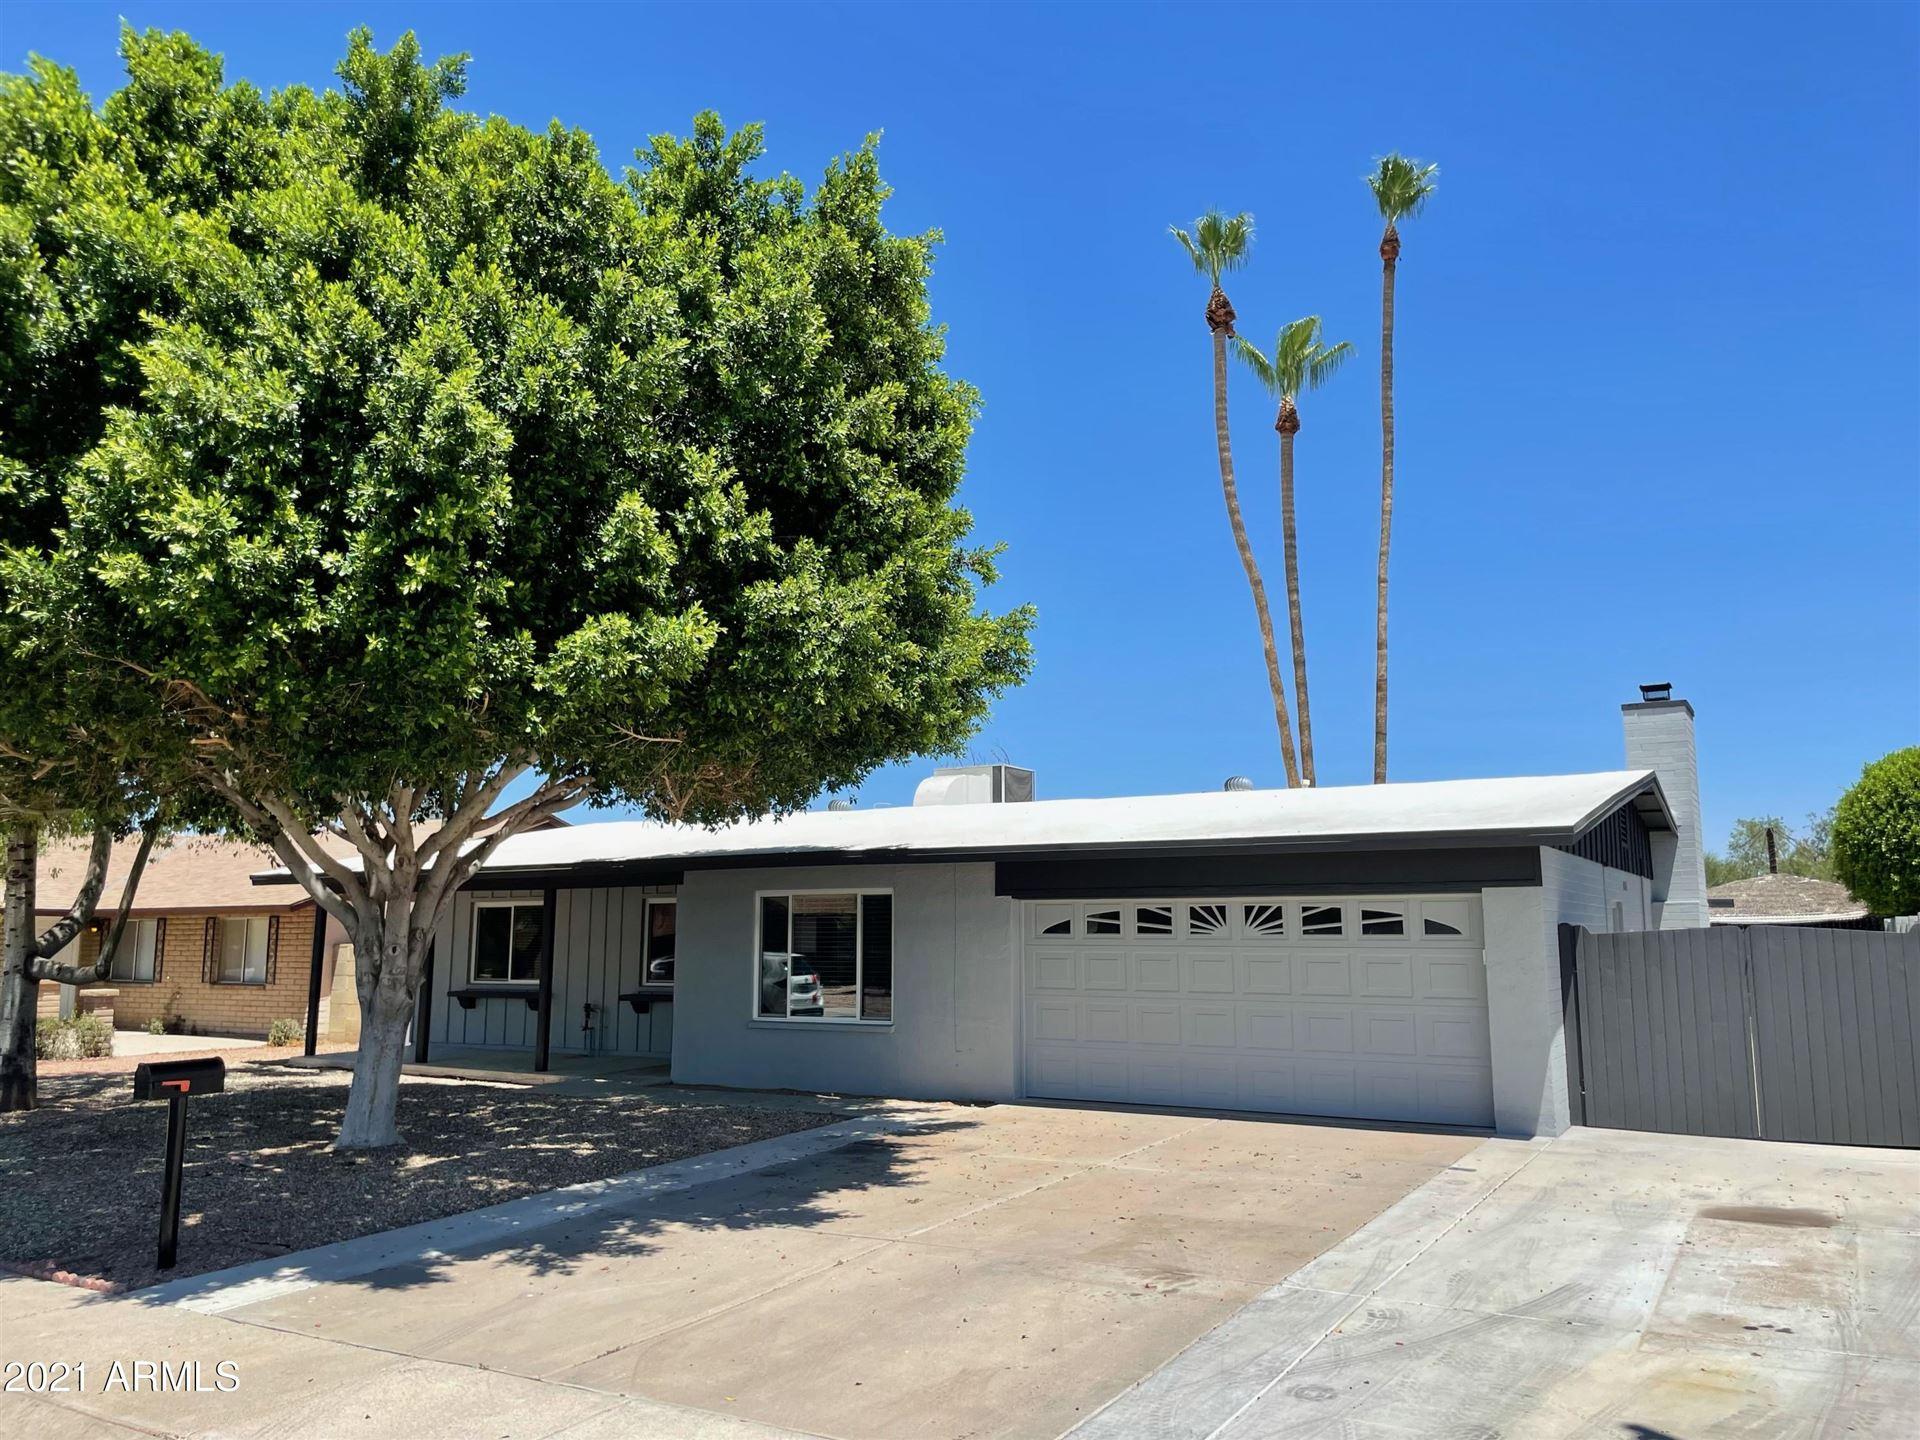 3040 W CROCUS Drive, Phoenix, AZ 85053 - MLS#: 6249723